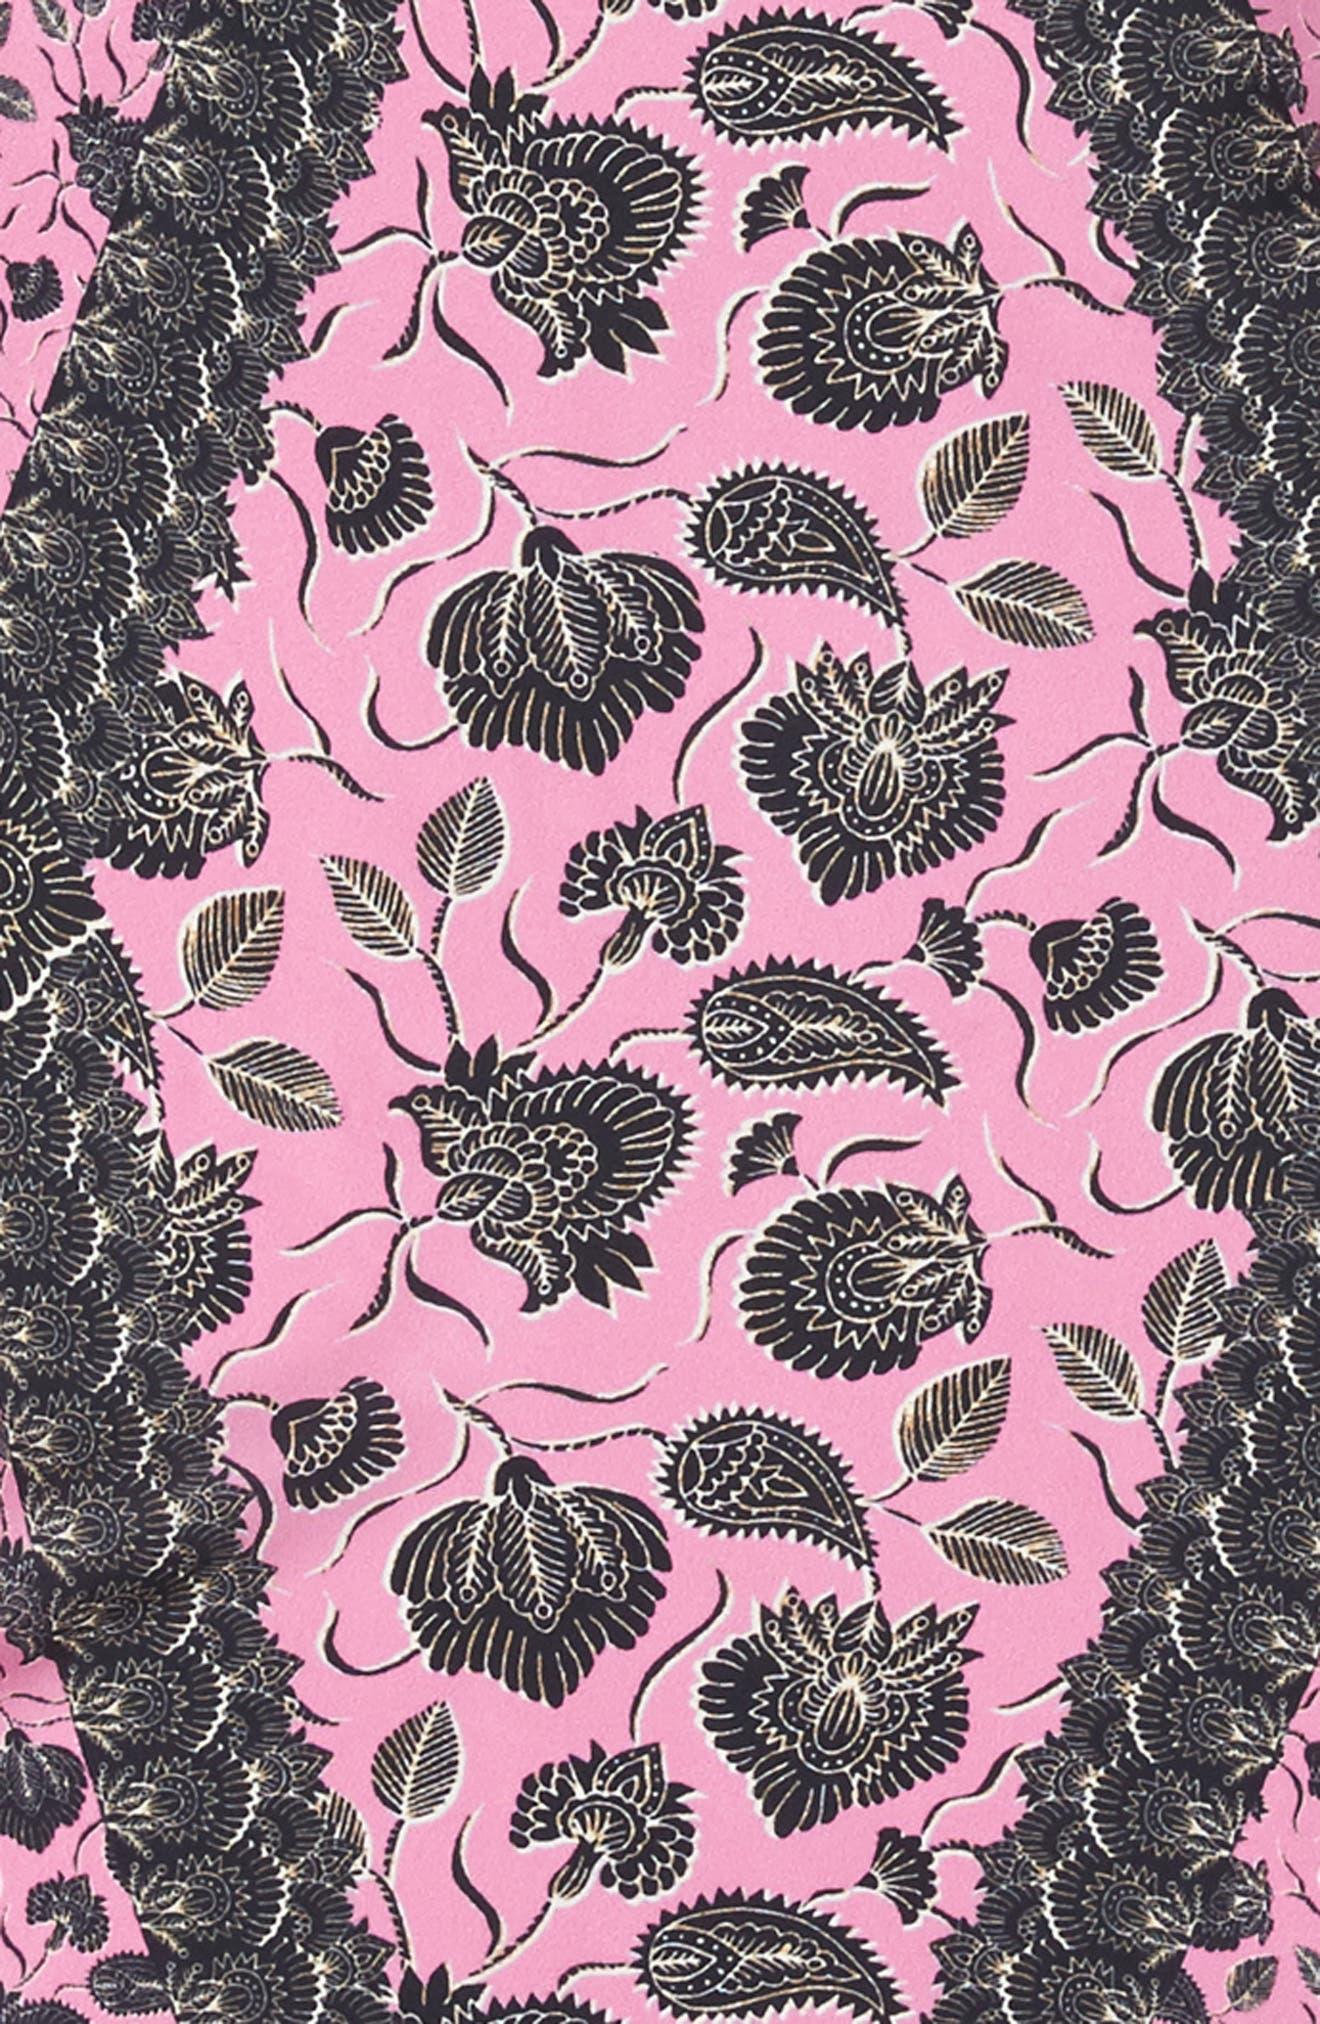 Lotus Paisley Diamond Silk Scarf,                             Alternate thumbnail 4, color,                             Fuchsia Pink